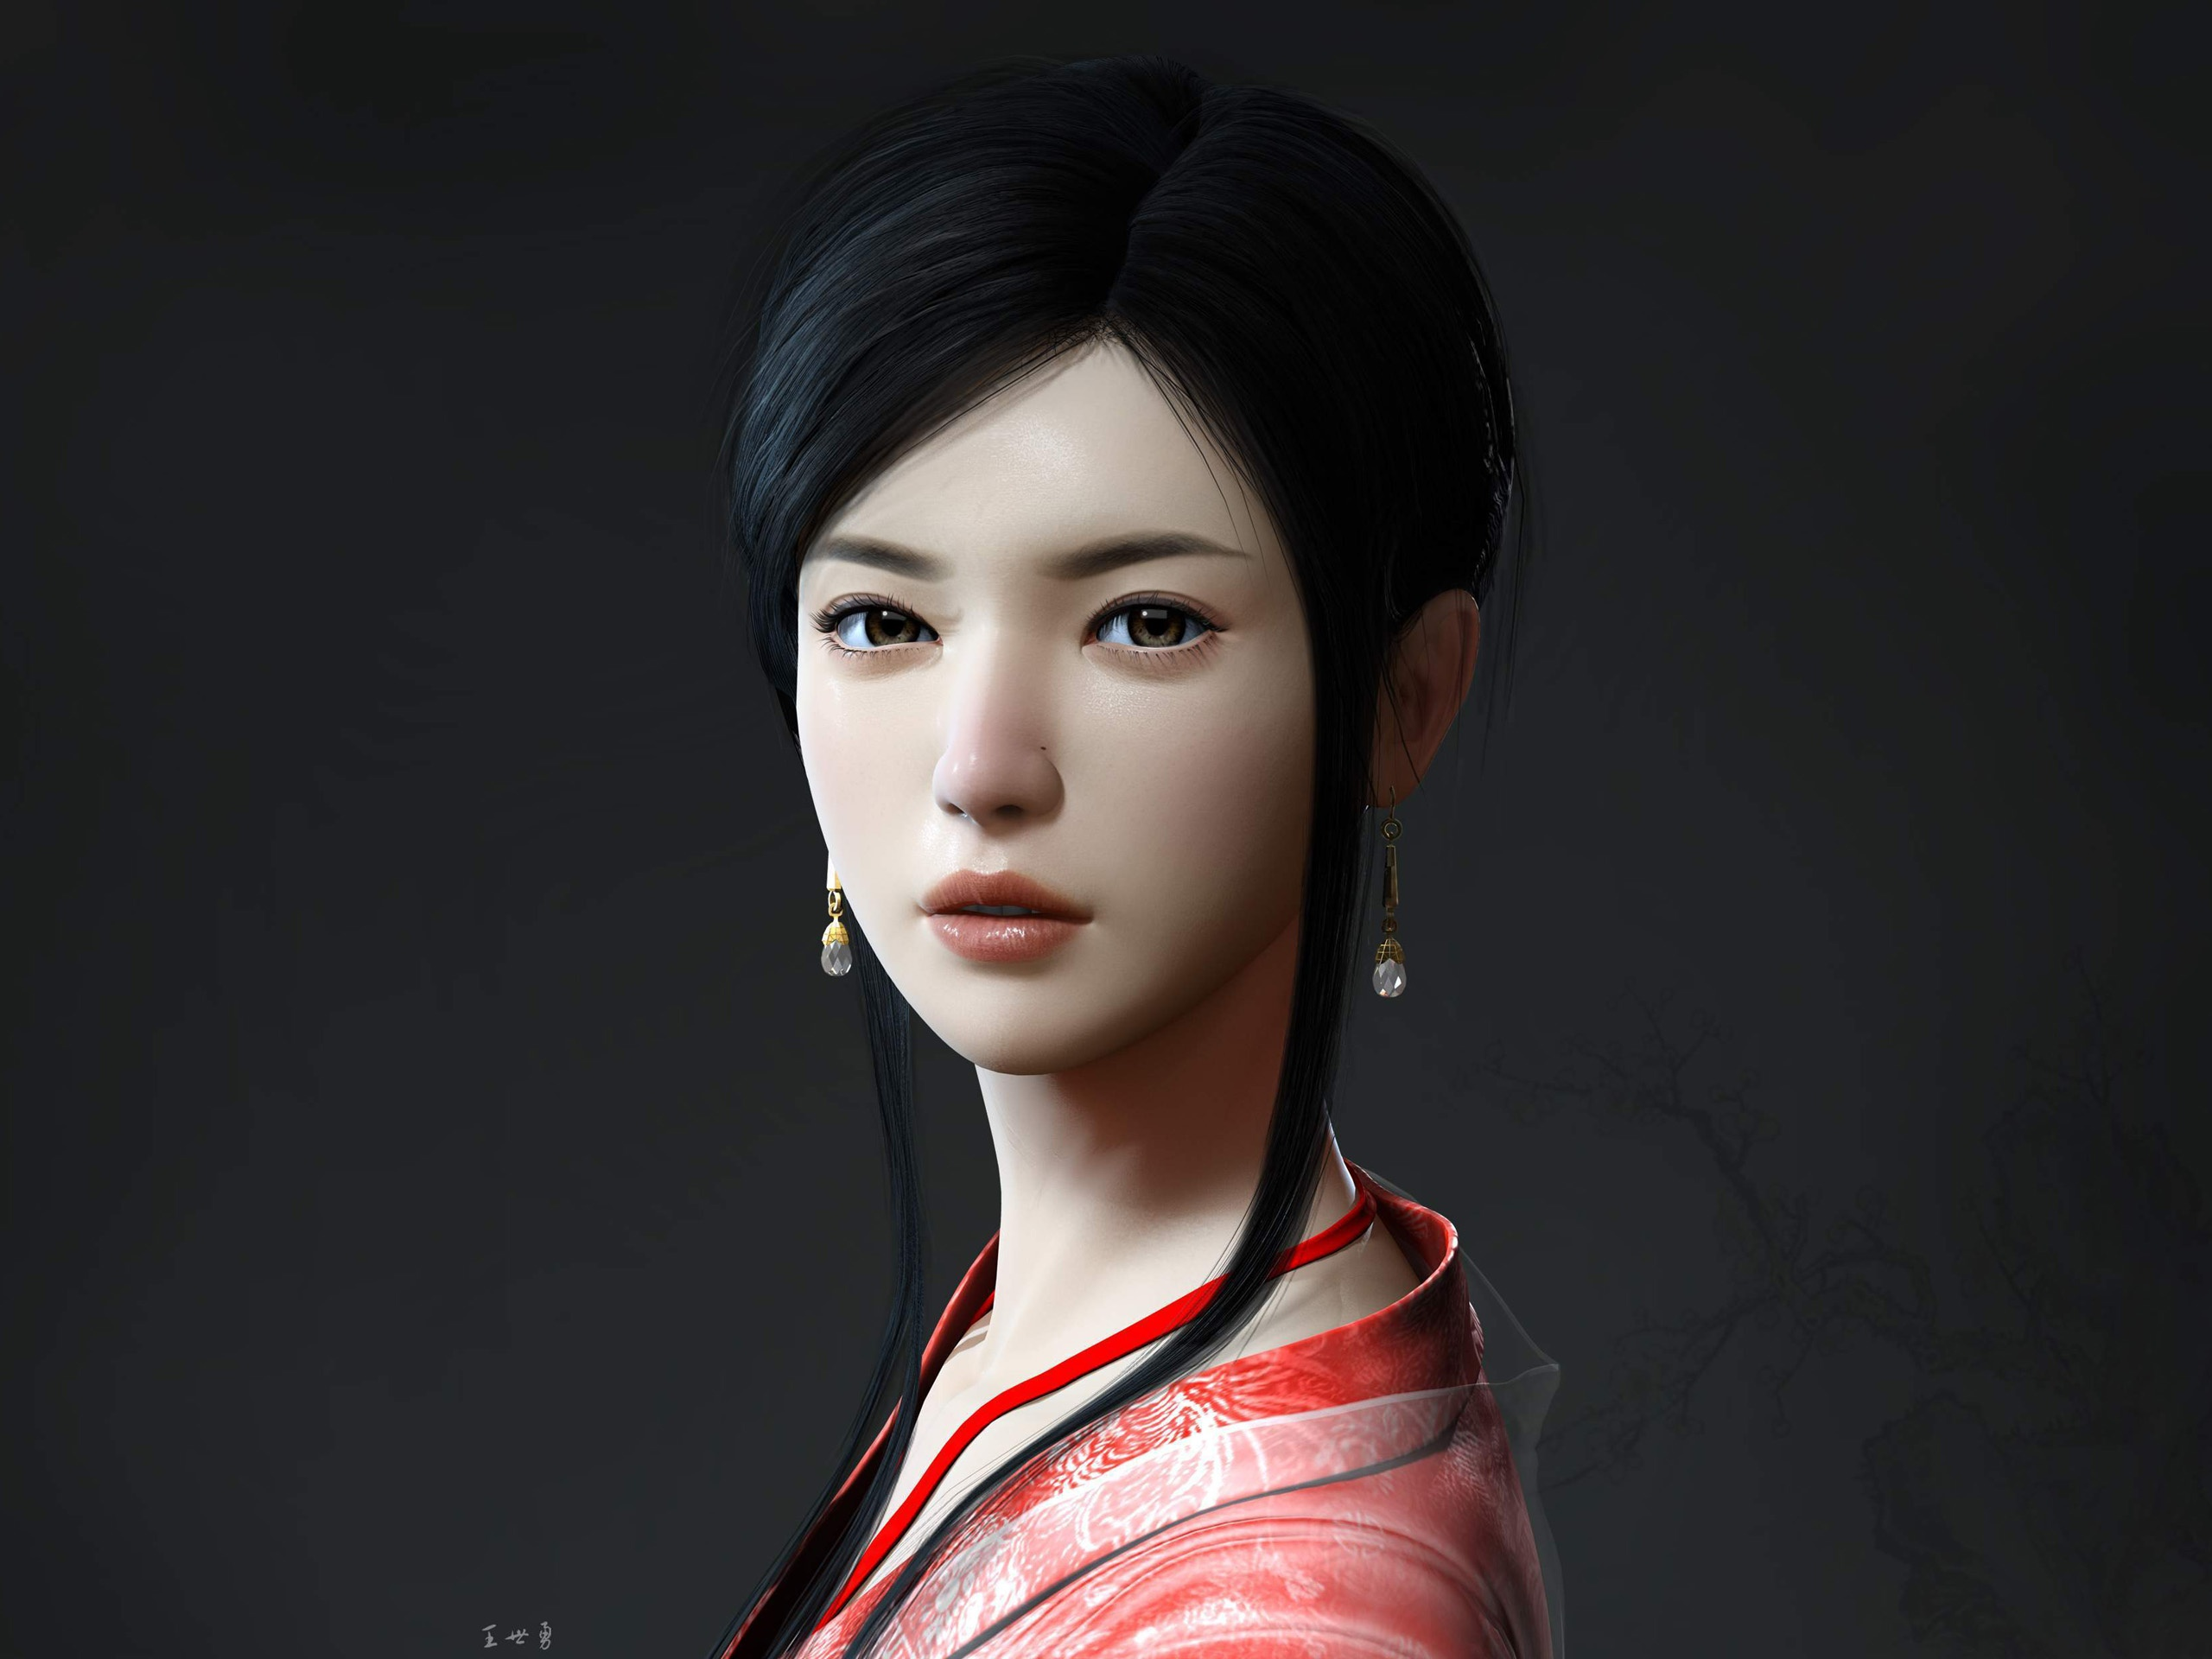 Calendar Girl Wallpaper Hd : Wallpaper beautiful girl in ancient china hd